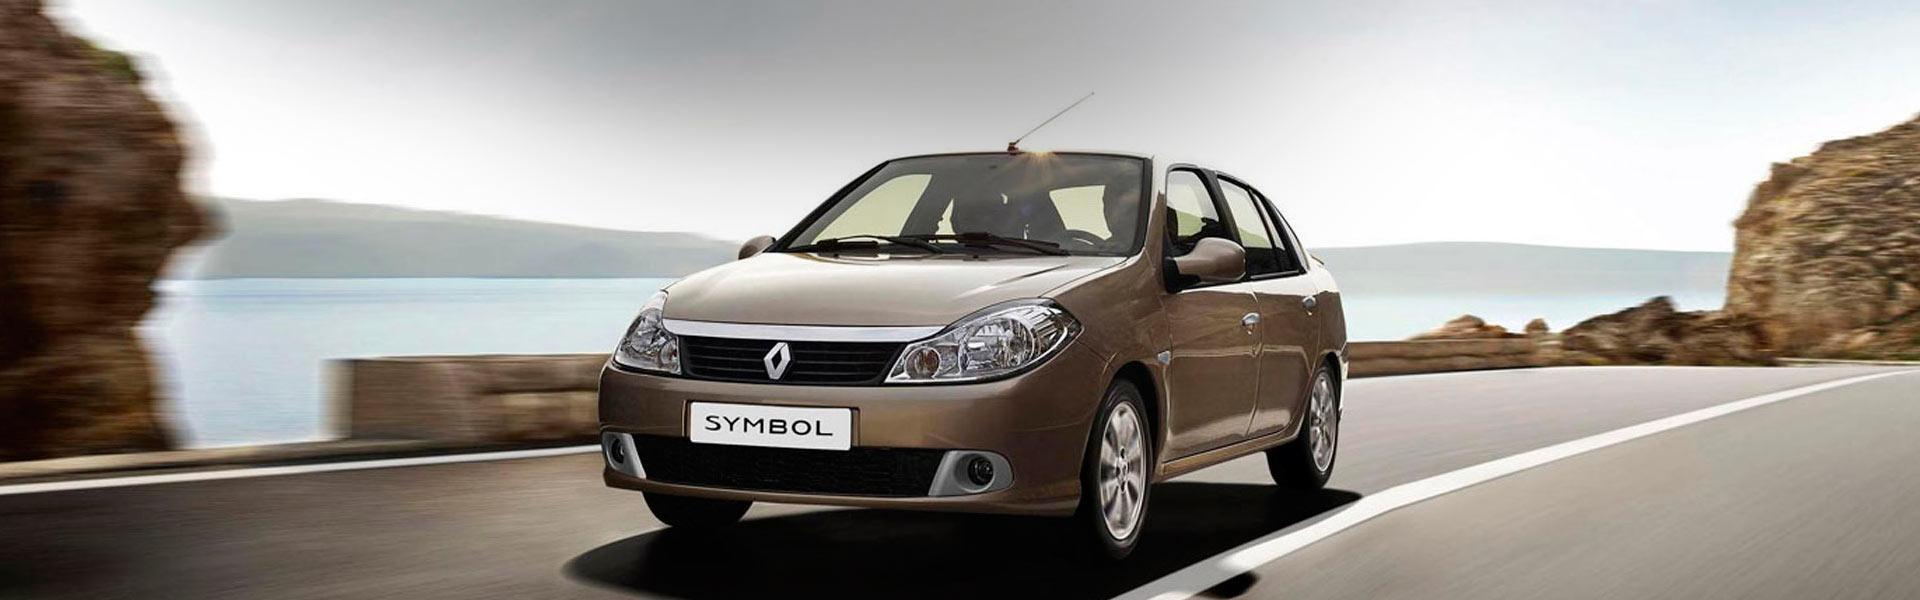 Сервис Renault Symbol